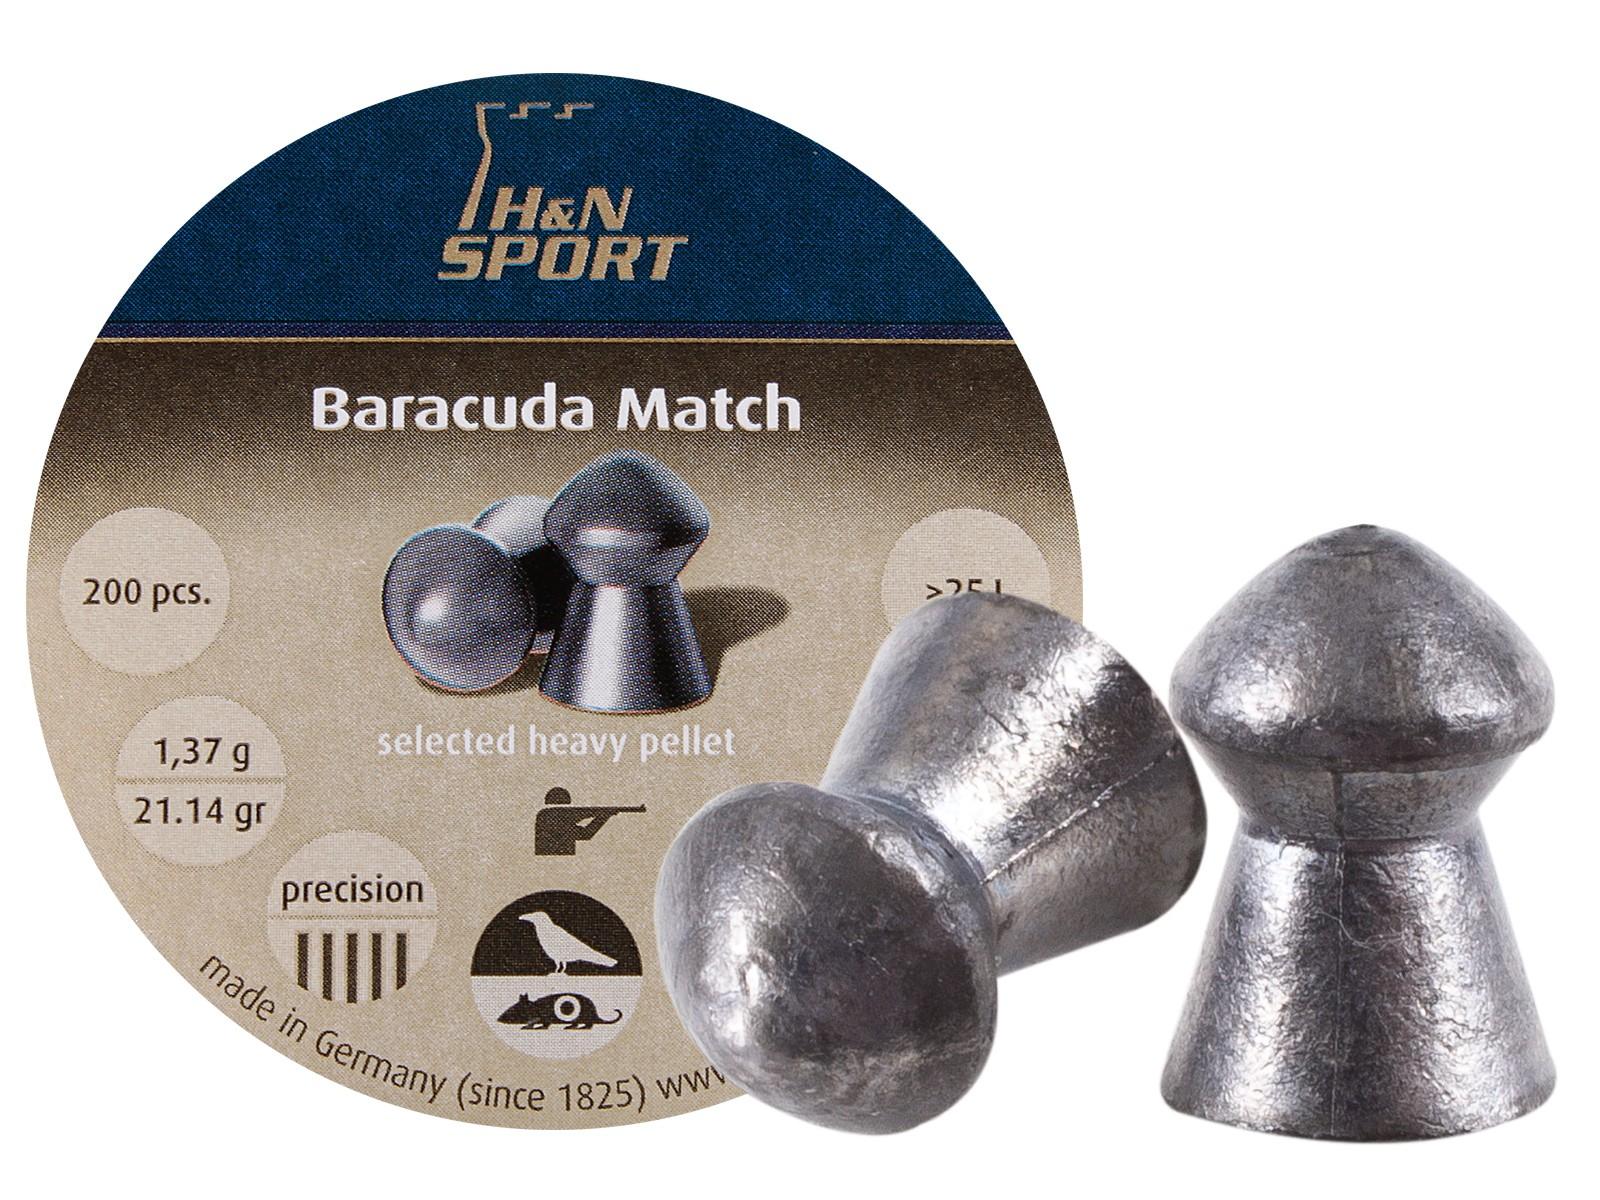 H&N Baracuda Match .22 Cal, 21.14 Grains, Round Nose, 200ct